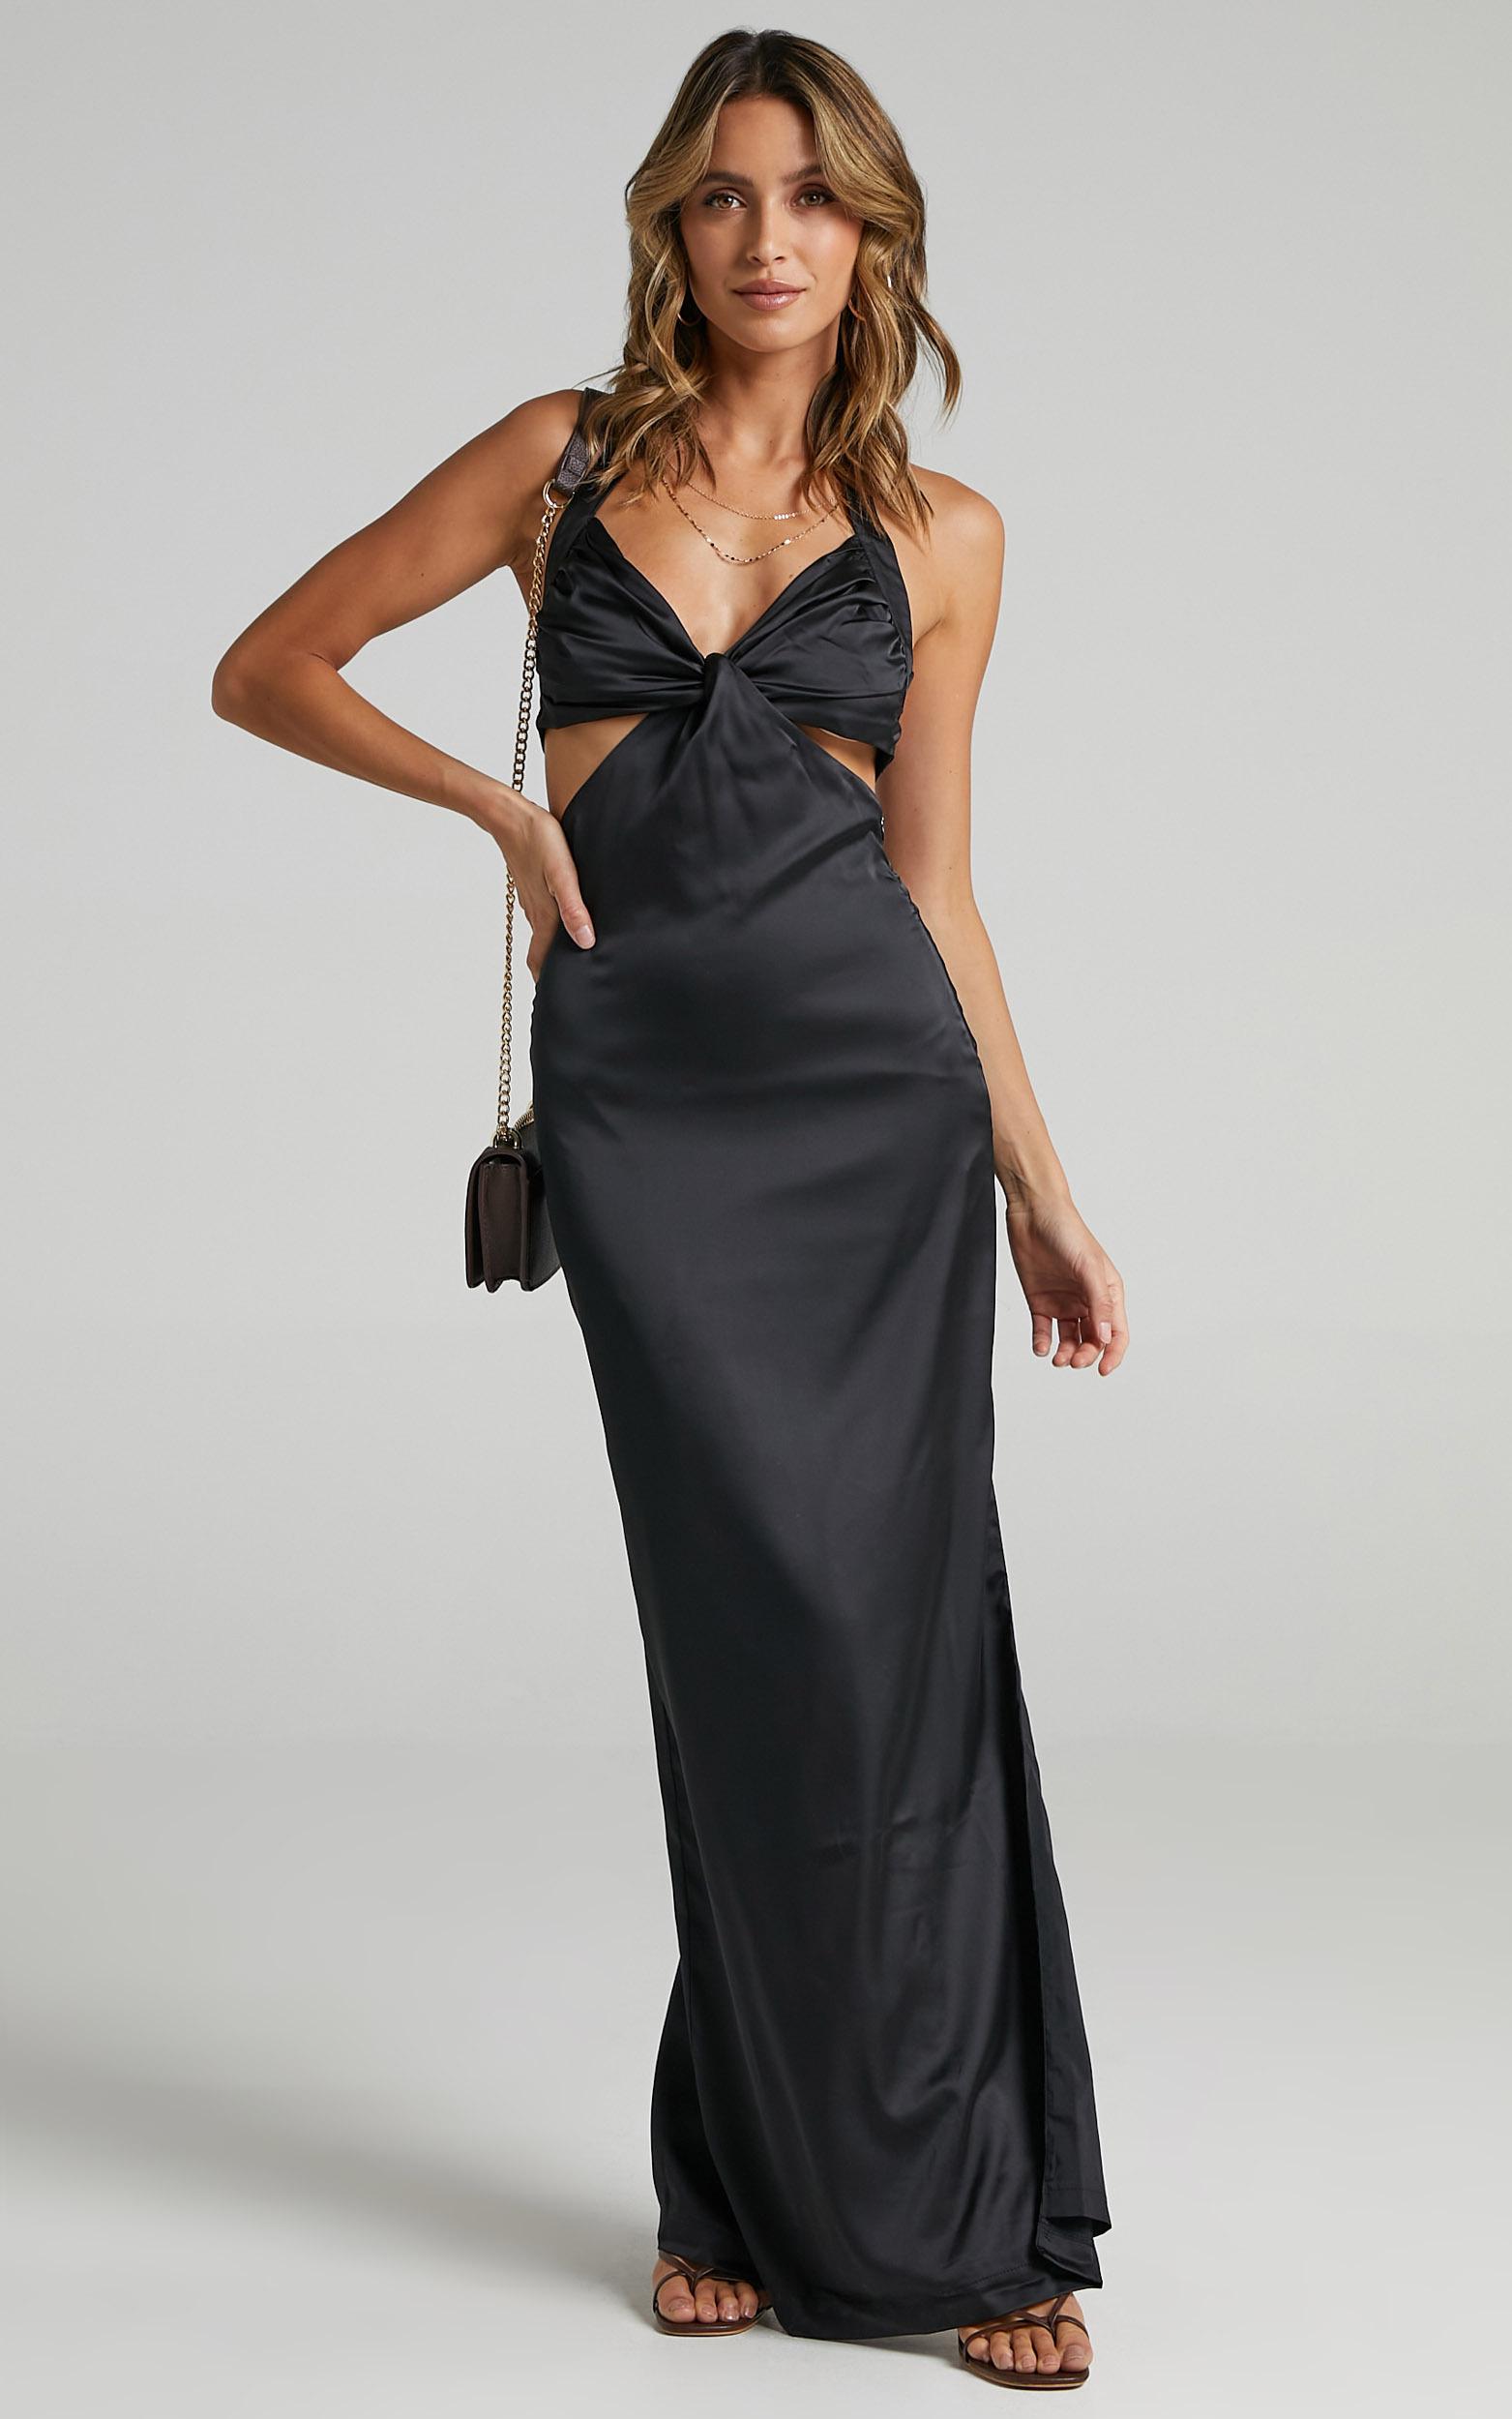 Maat Dress in Black Satin - 06, BLK1, hi-res image number null